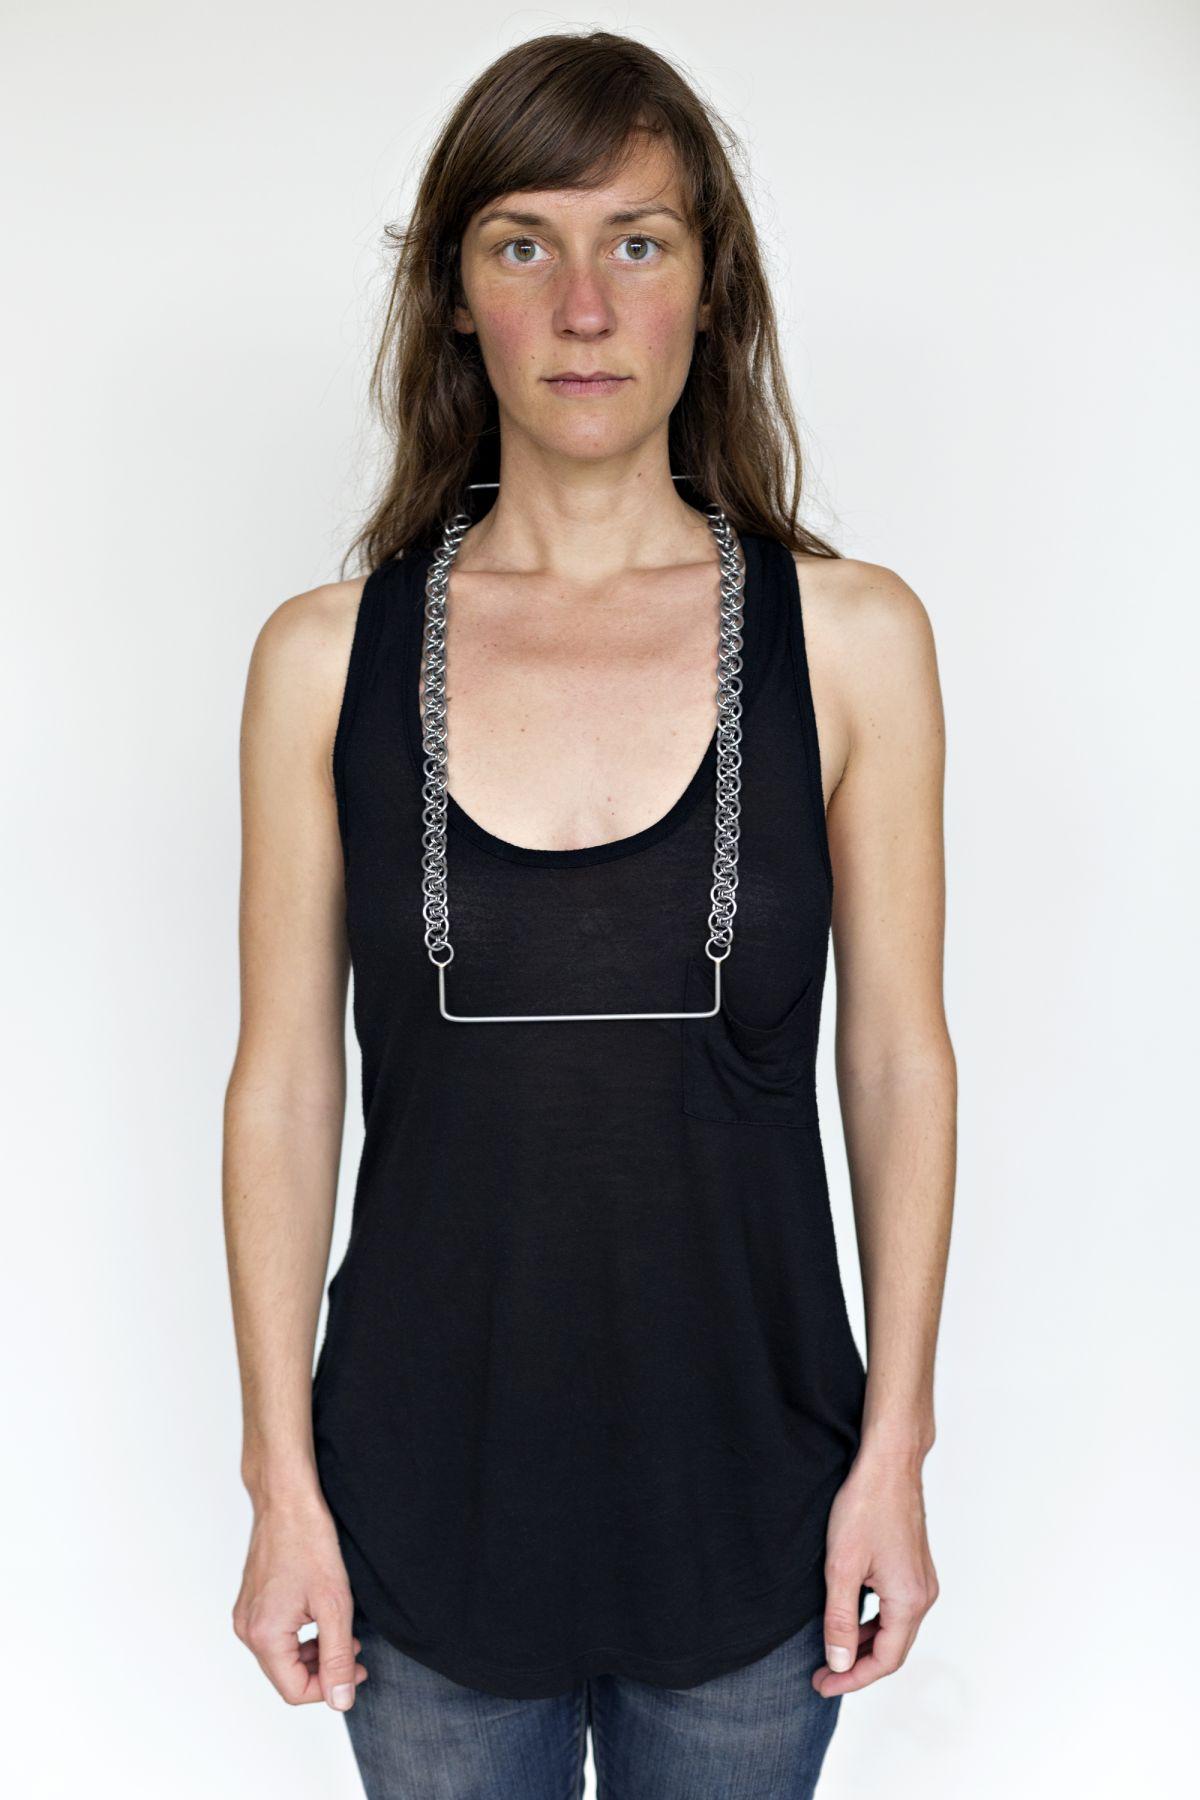 Rebekah Frank necklace